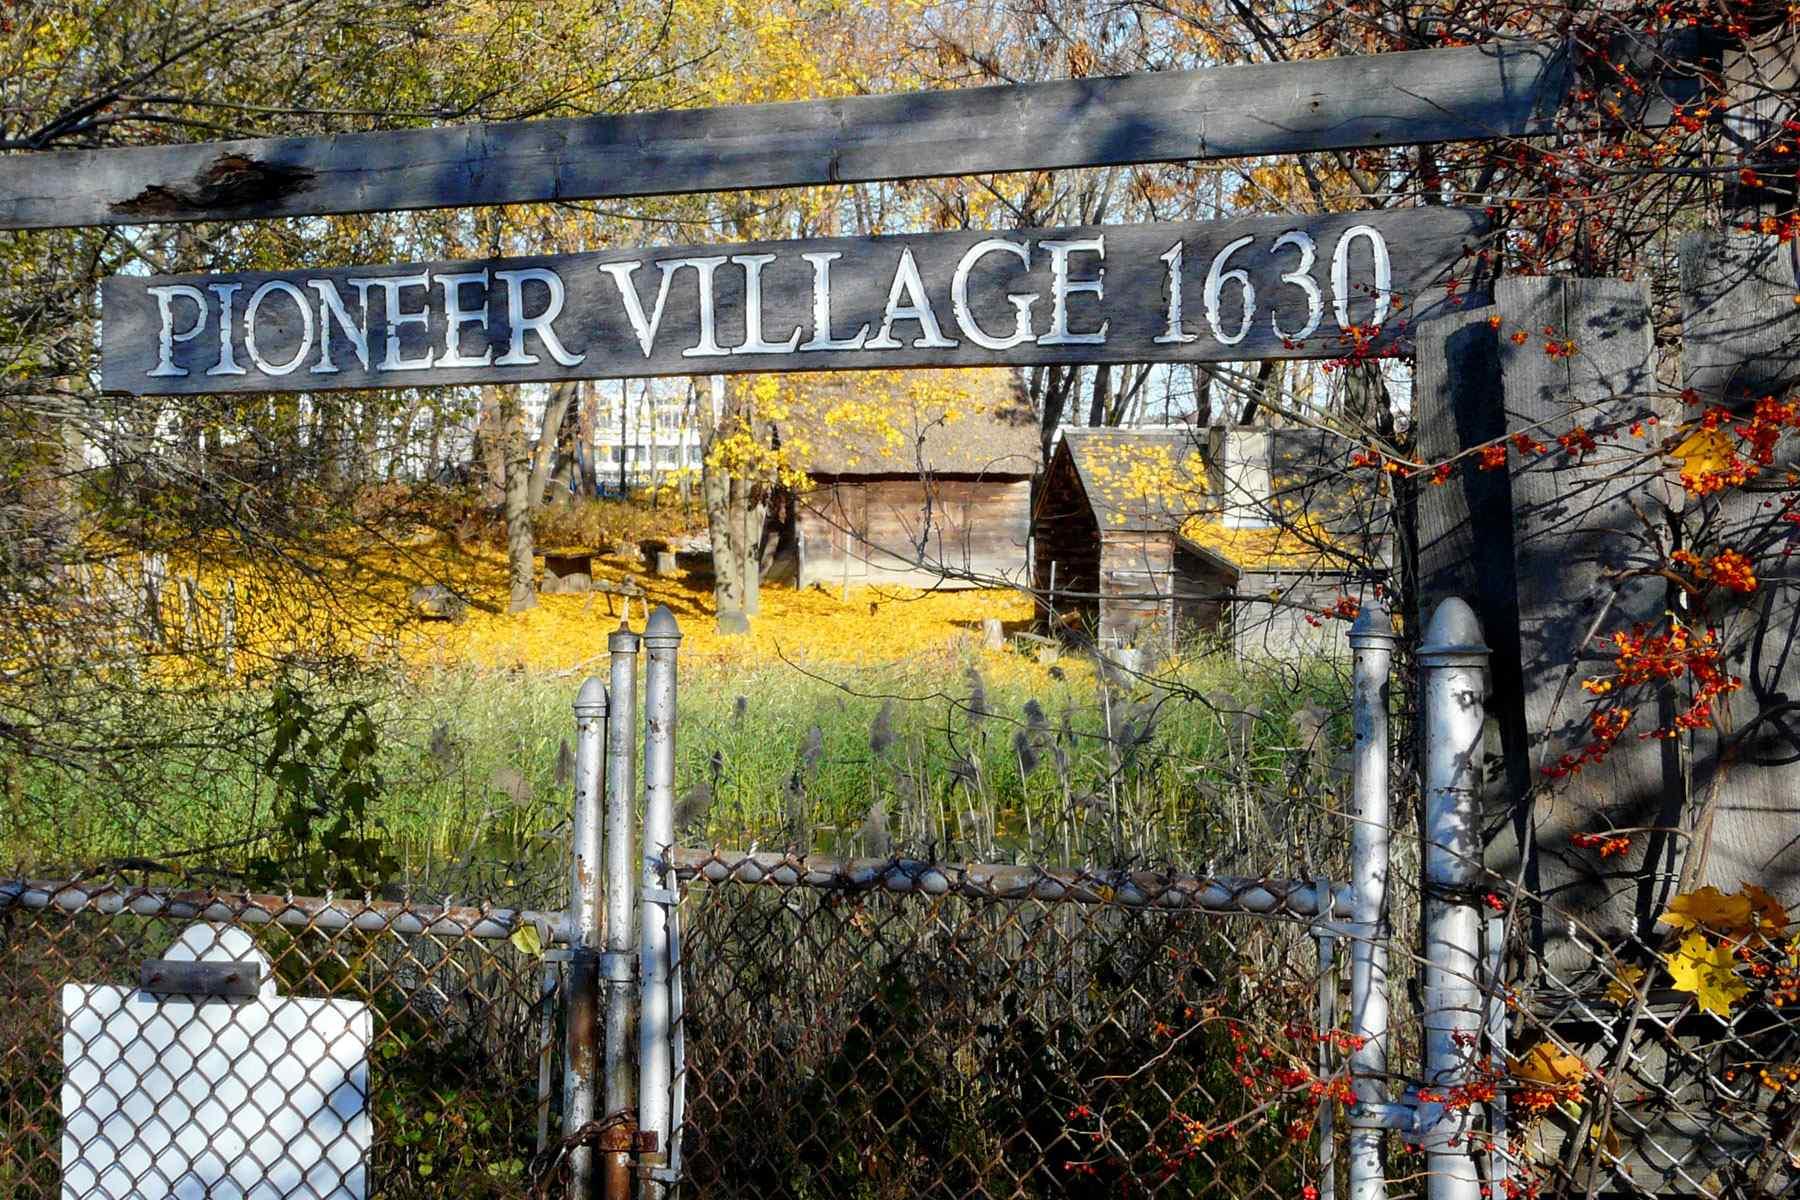 12 Things to Do in Salem, Massachusetts